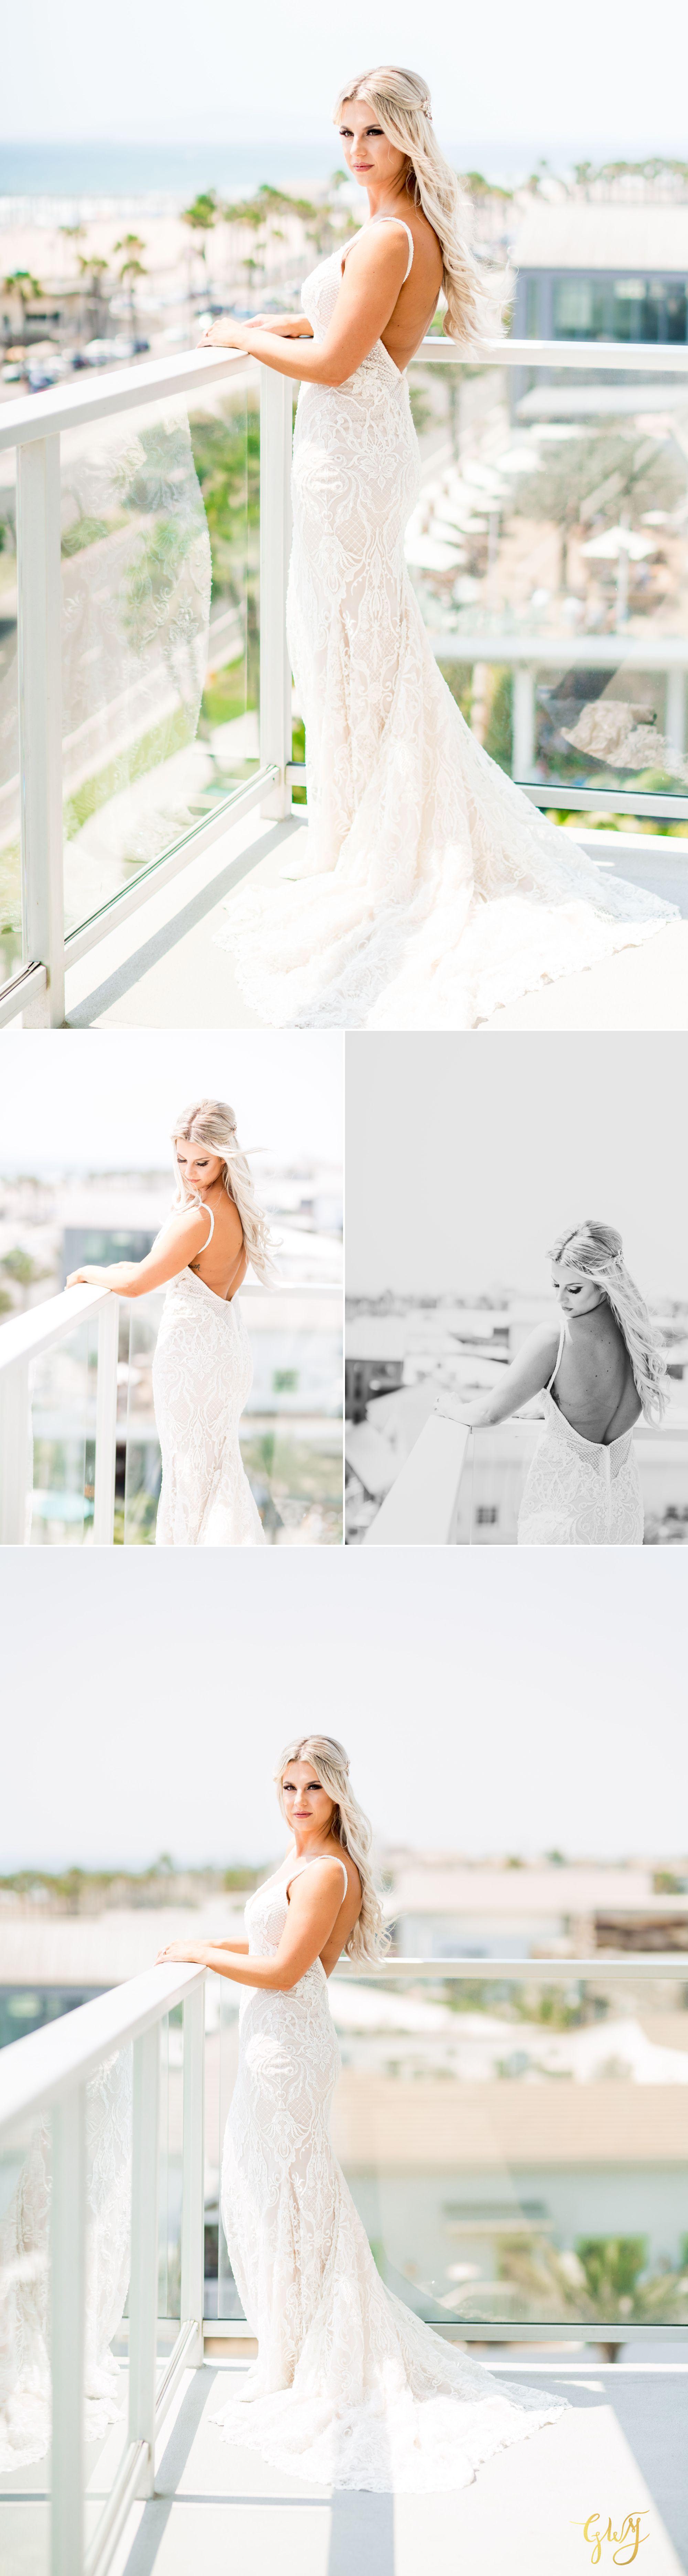 Christien + Crystal Pasea Hotel & Spa Huntington Beach Wedding by Glass Woods Media 12.jpg